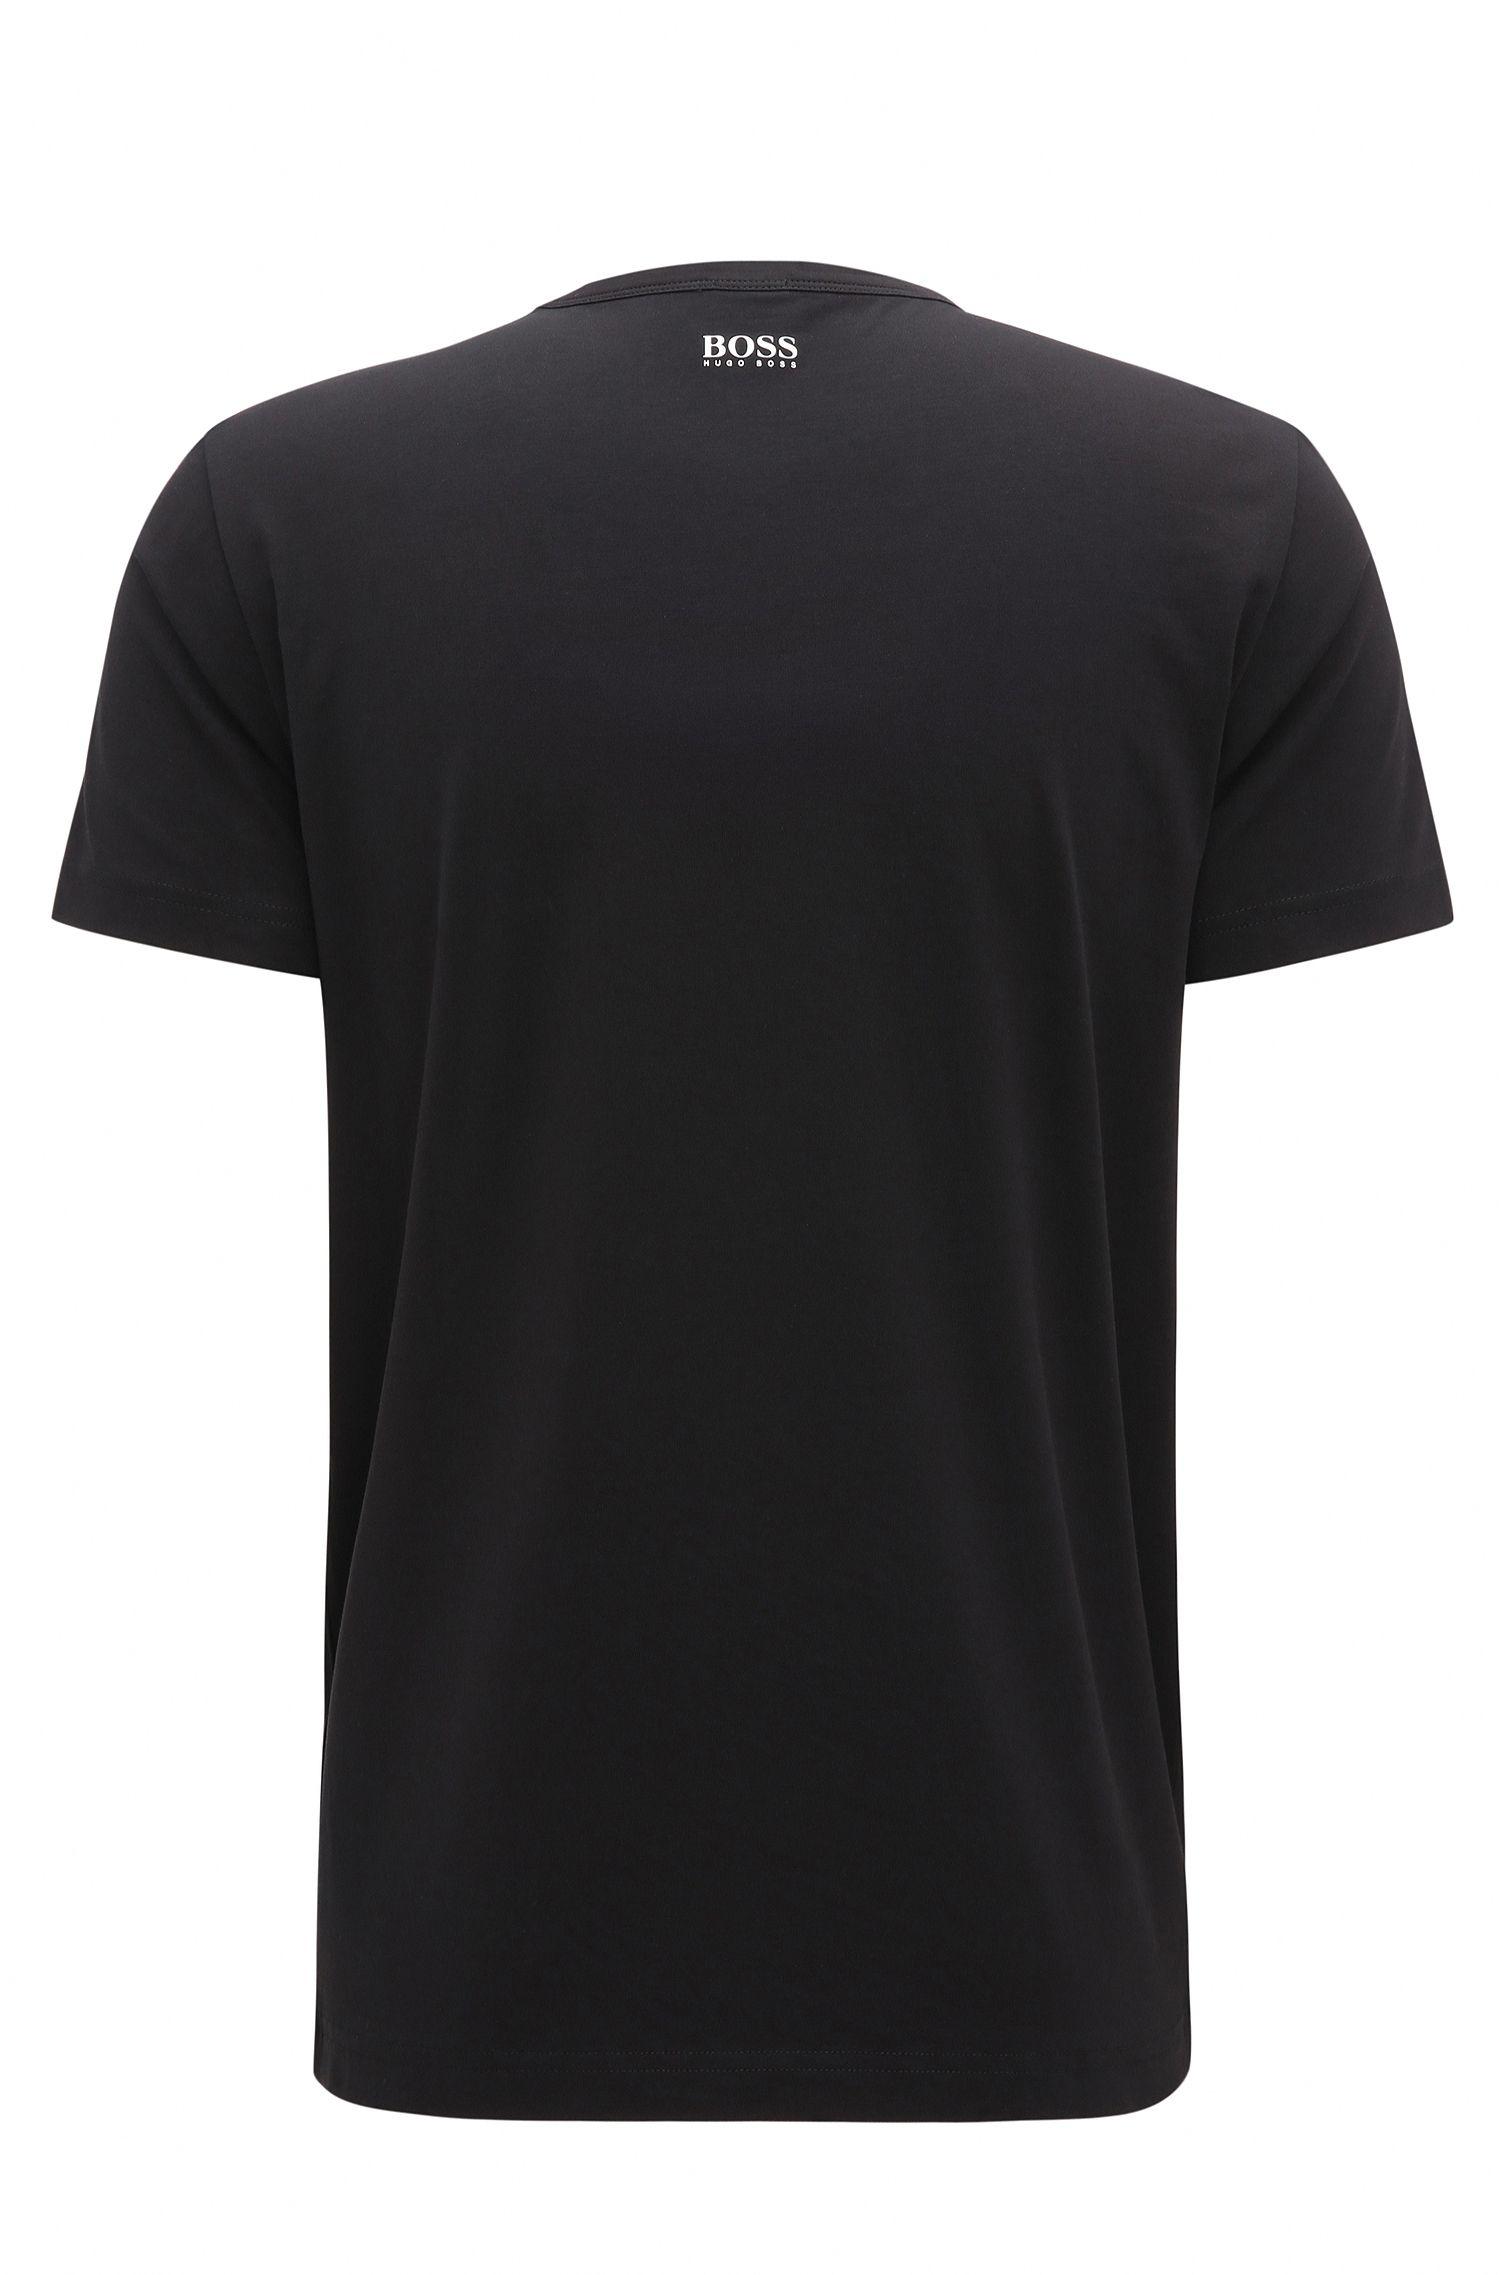 Logo-Print Stretch Cotton Graphic T-Shirt | Tee, Black